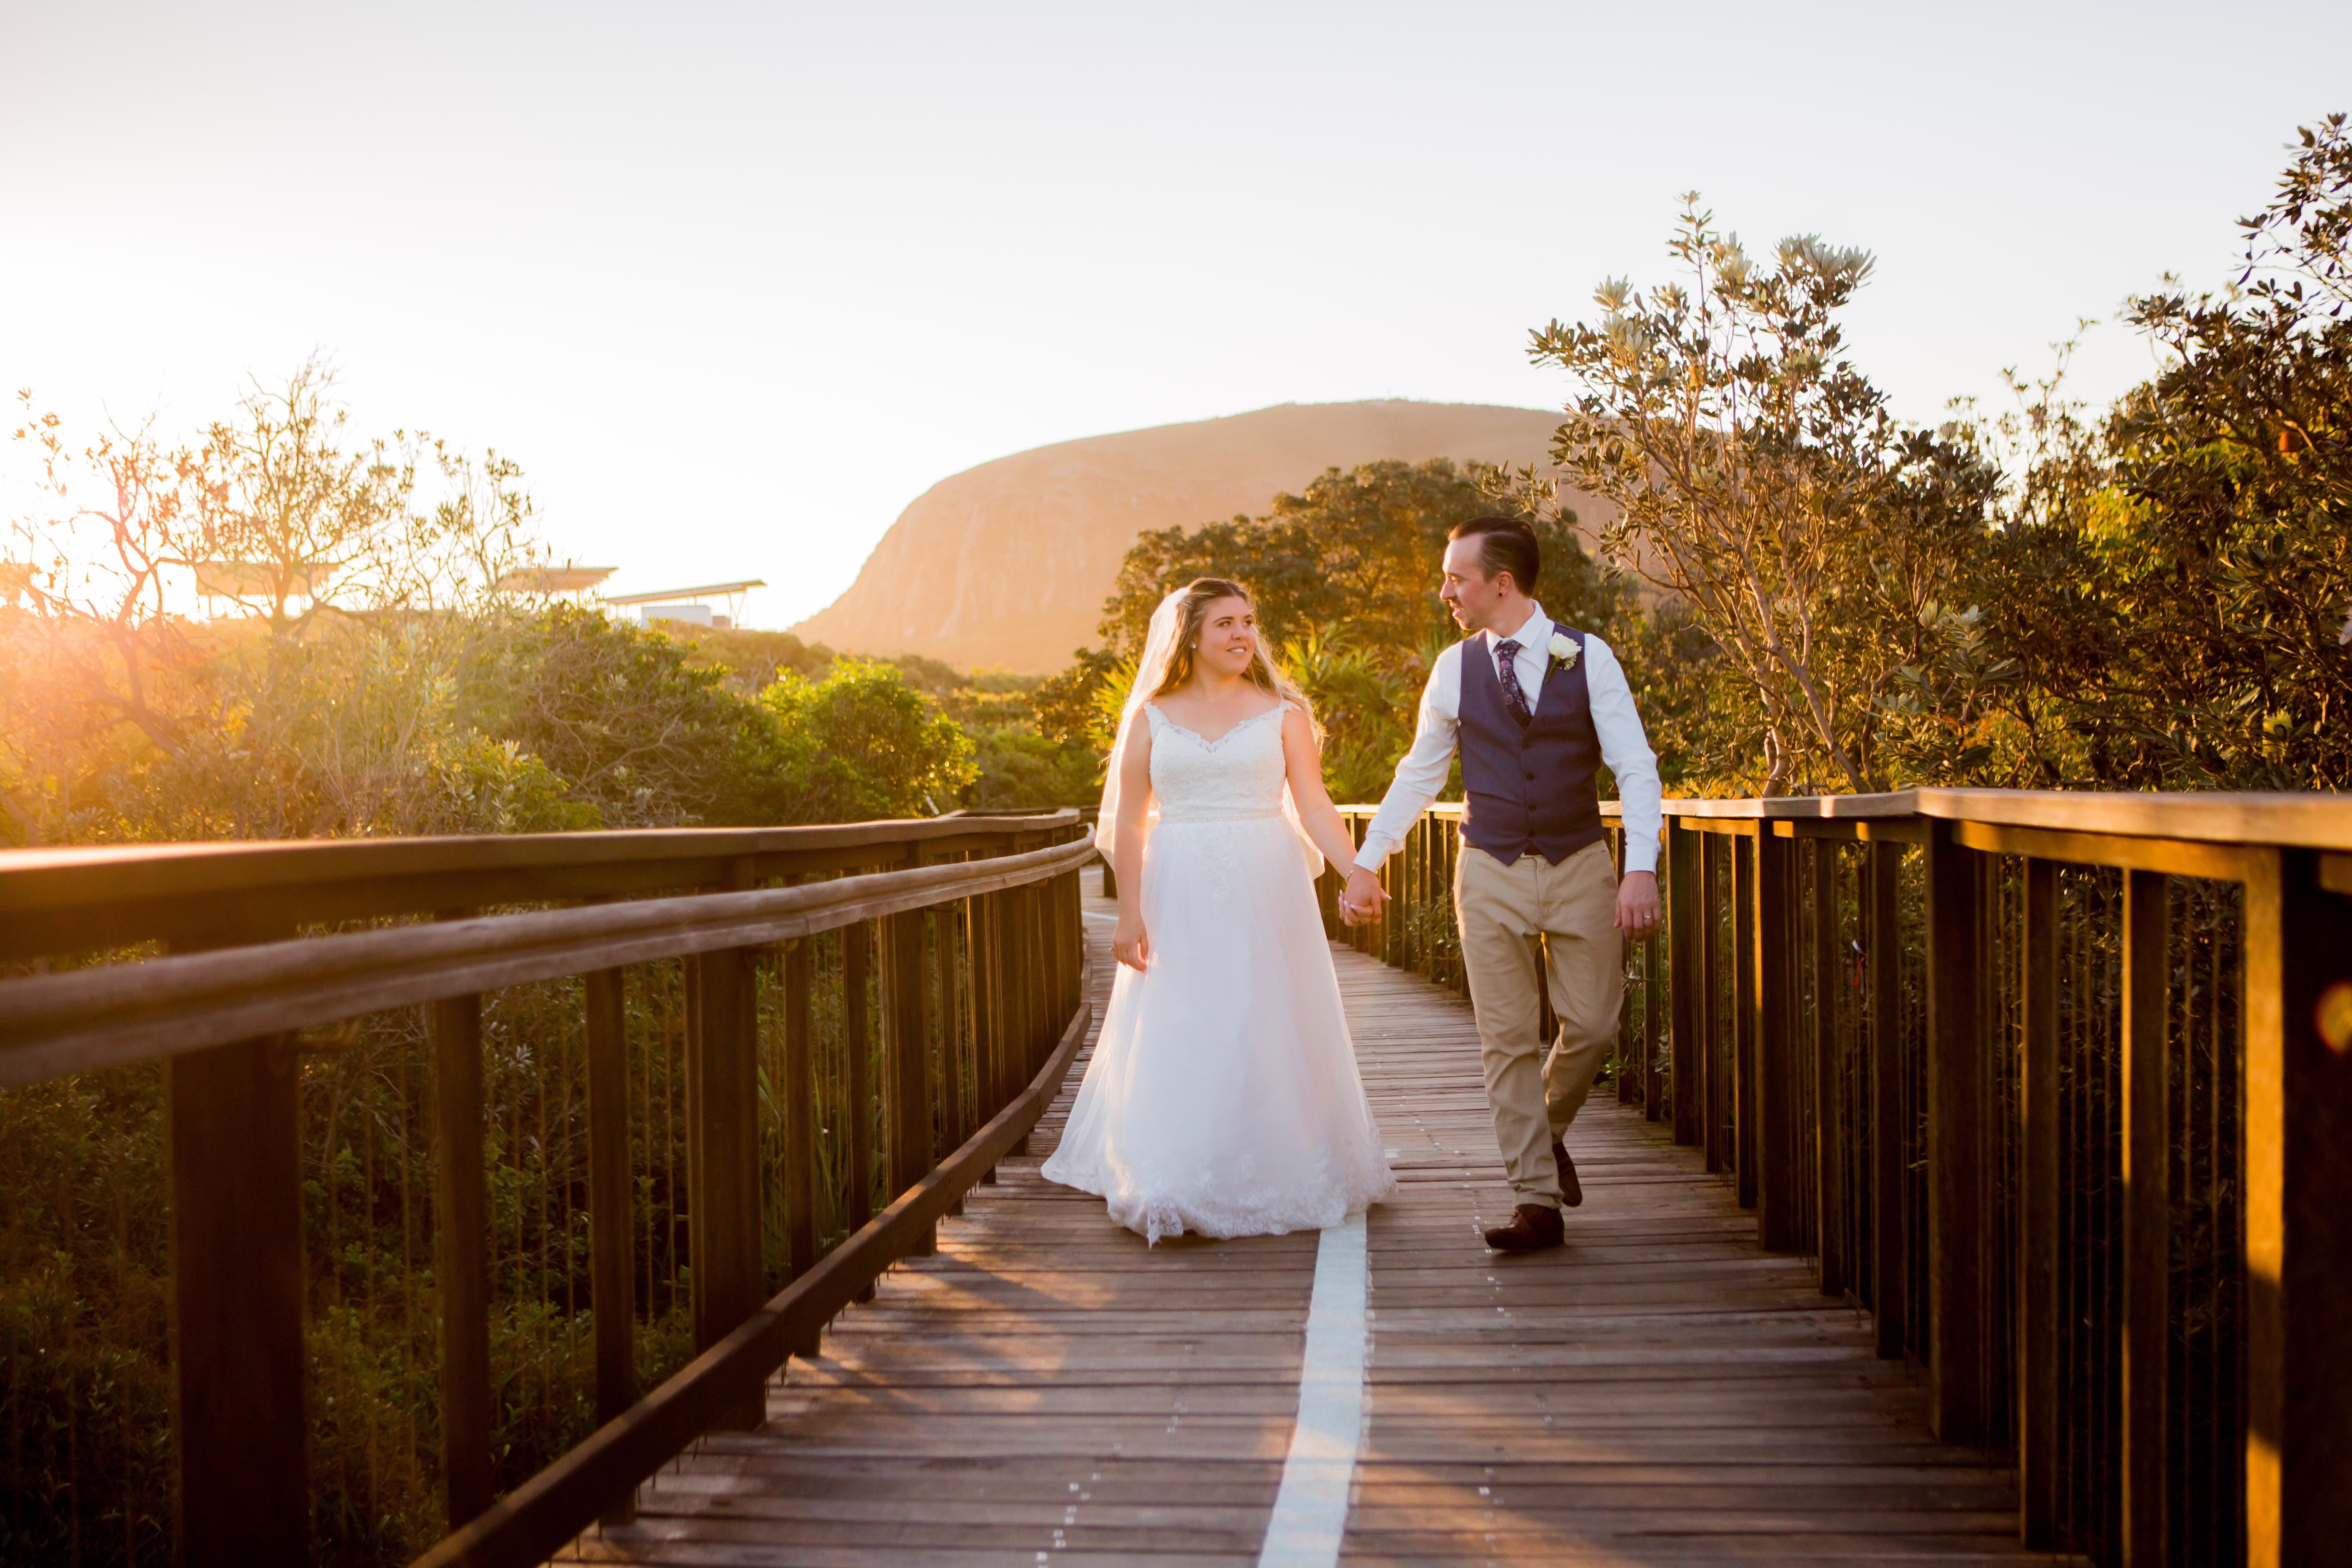 Coolum Beach wedding